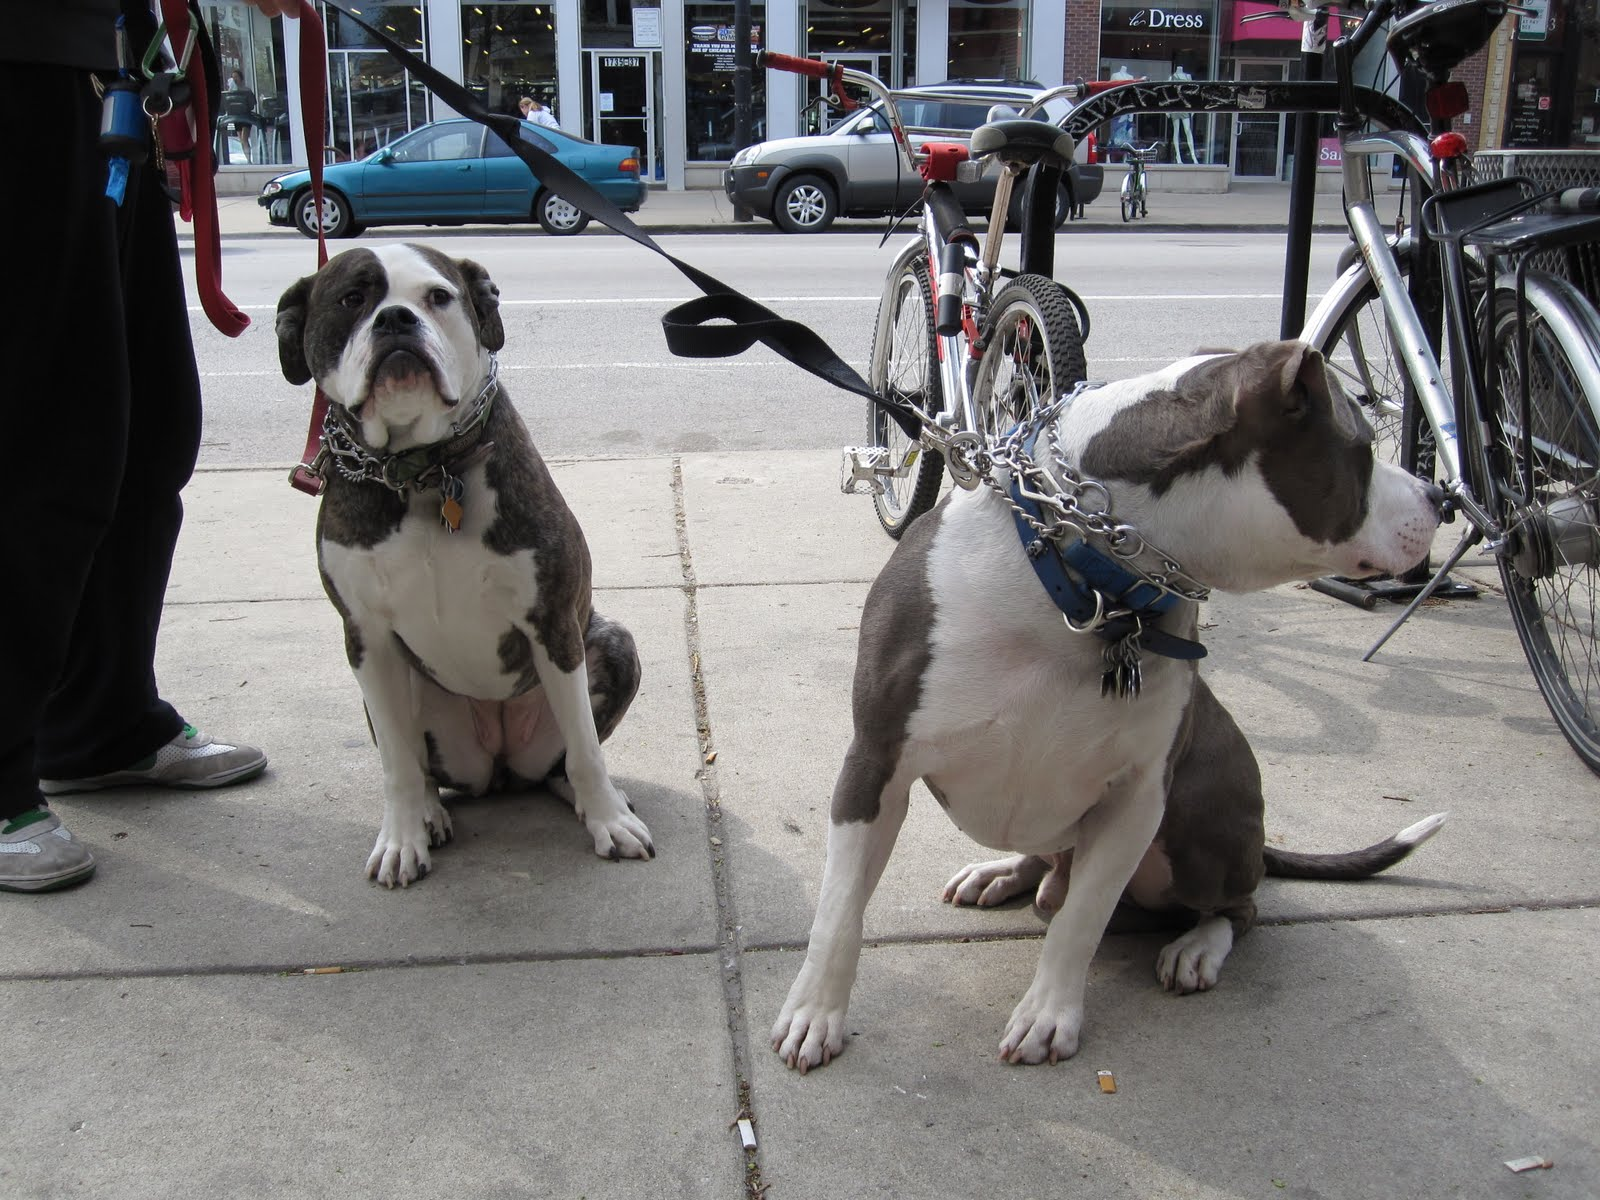 Welles Park Chicago Dogs